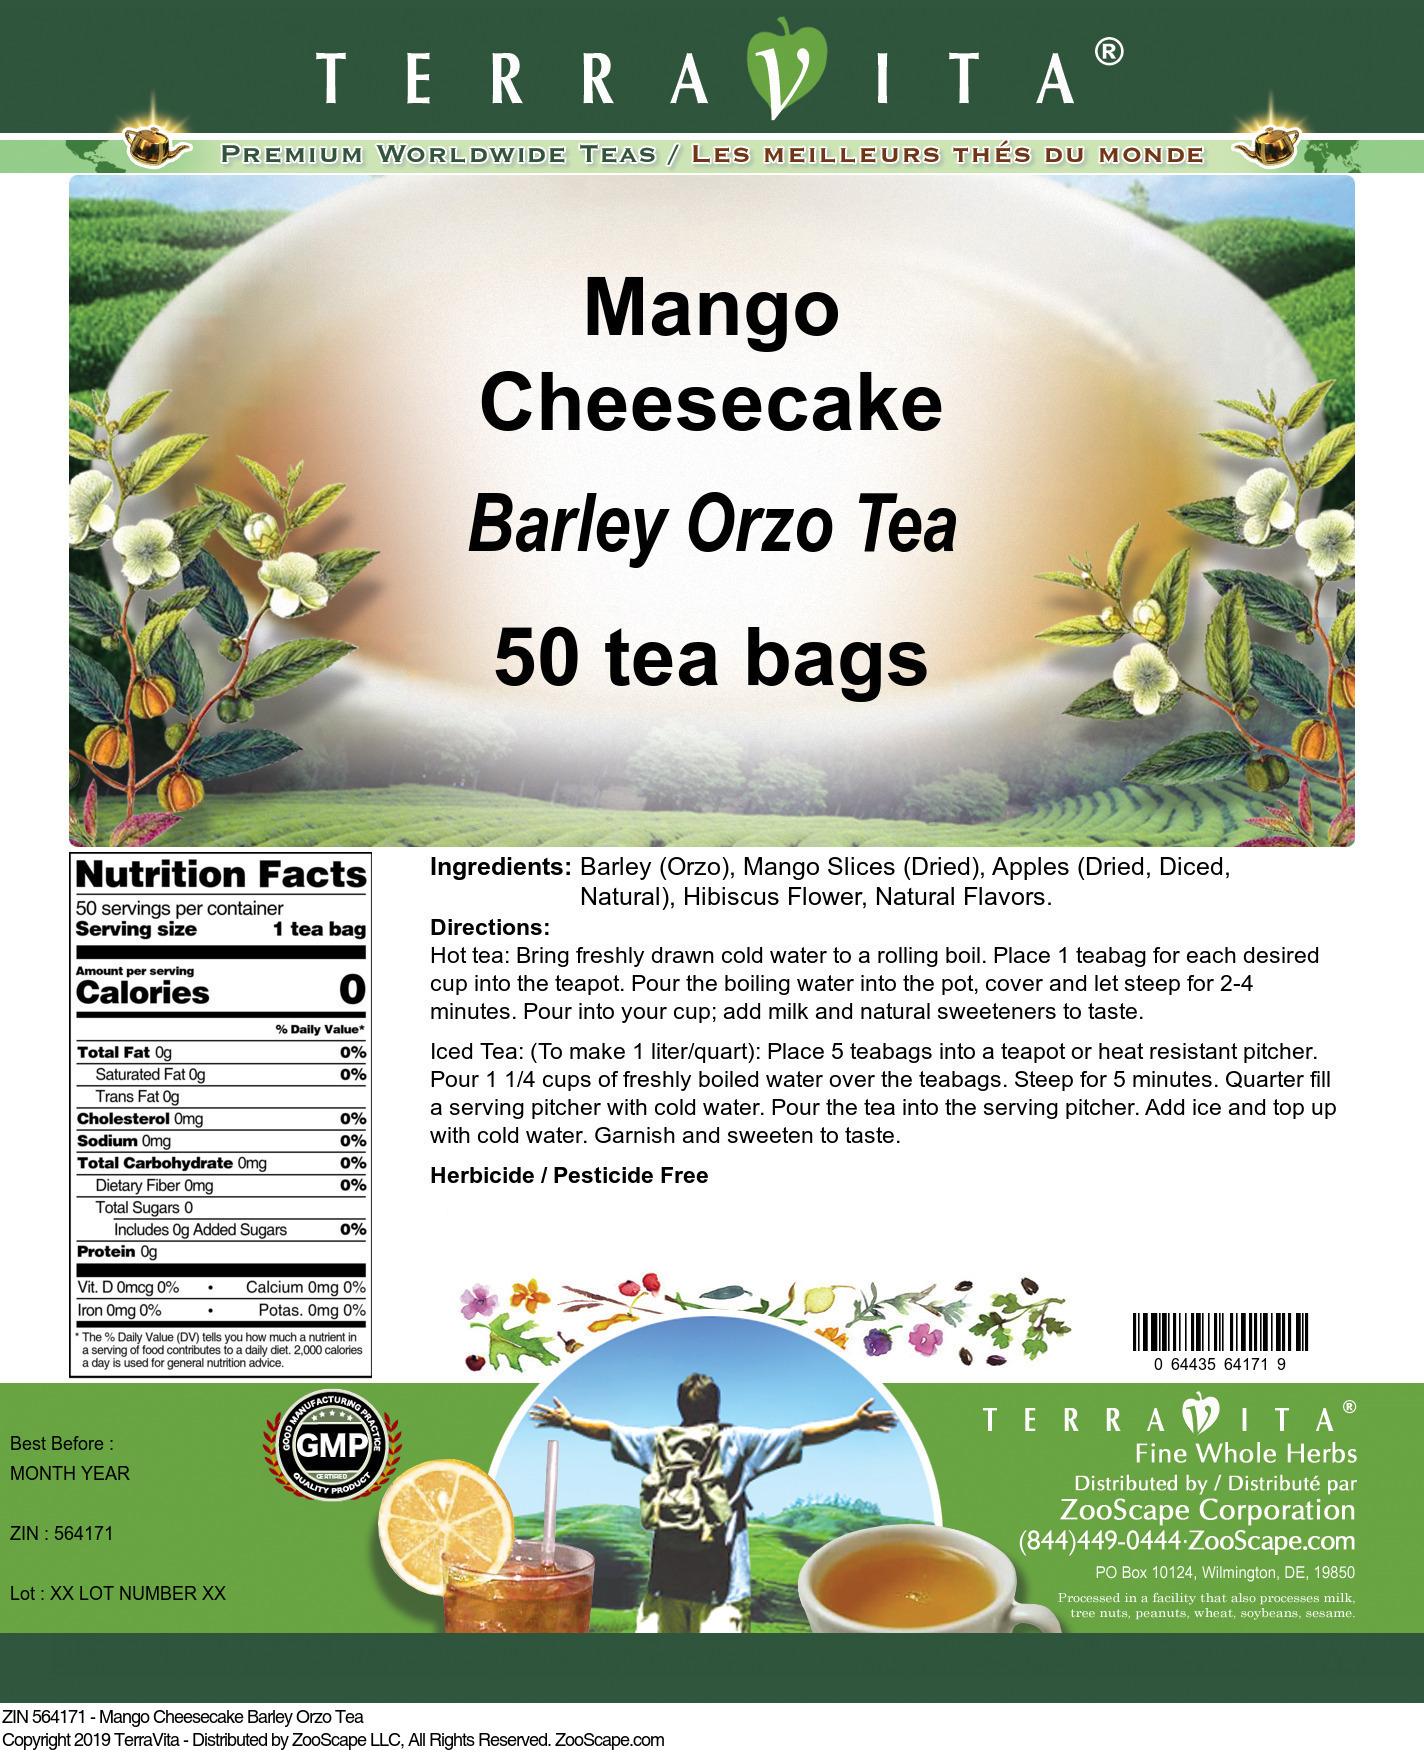 Mango Cheesecake Barley Orzo Tea